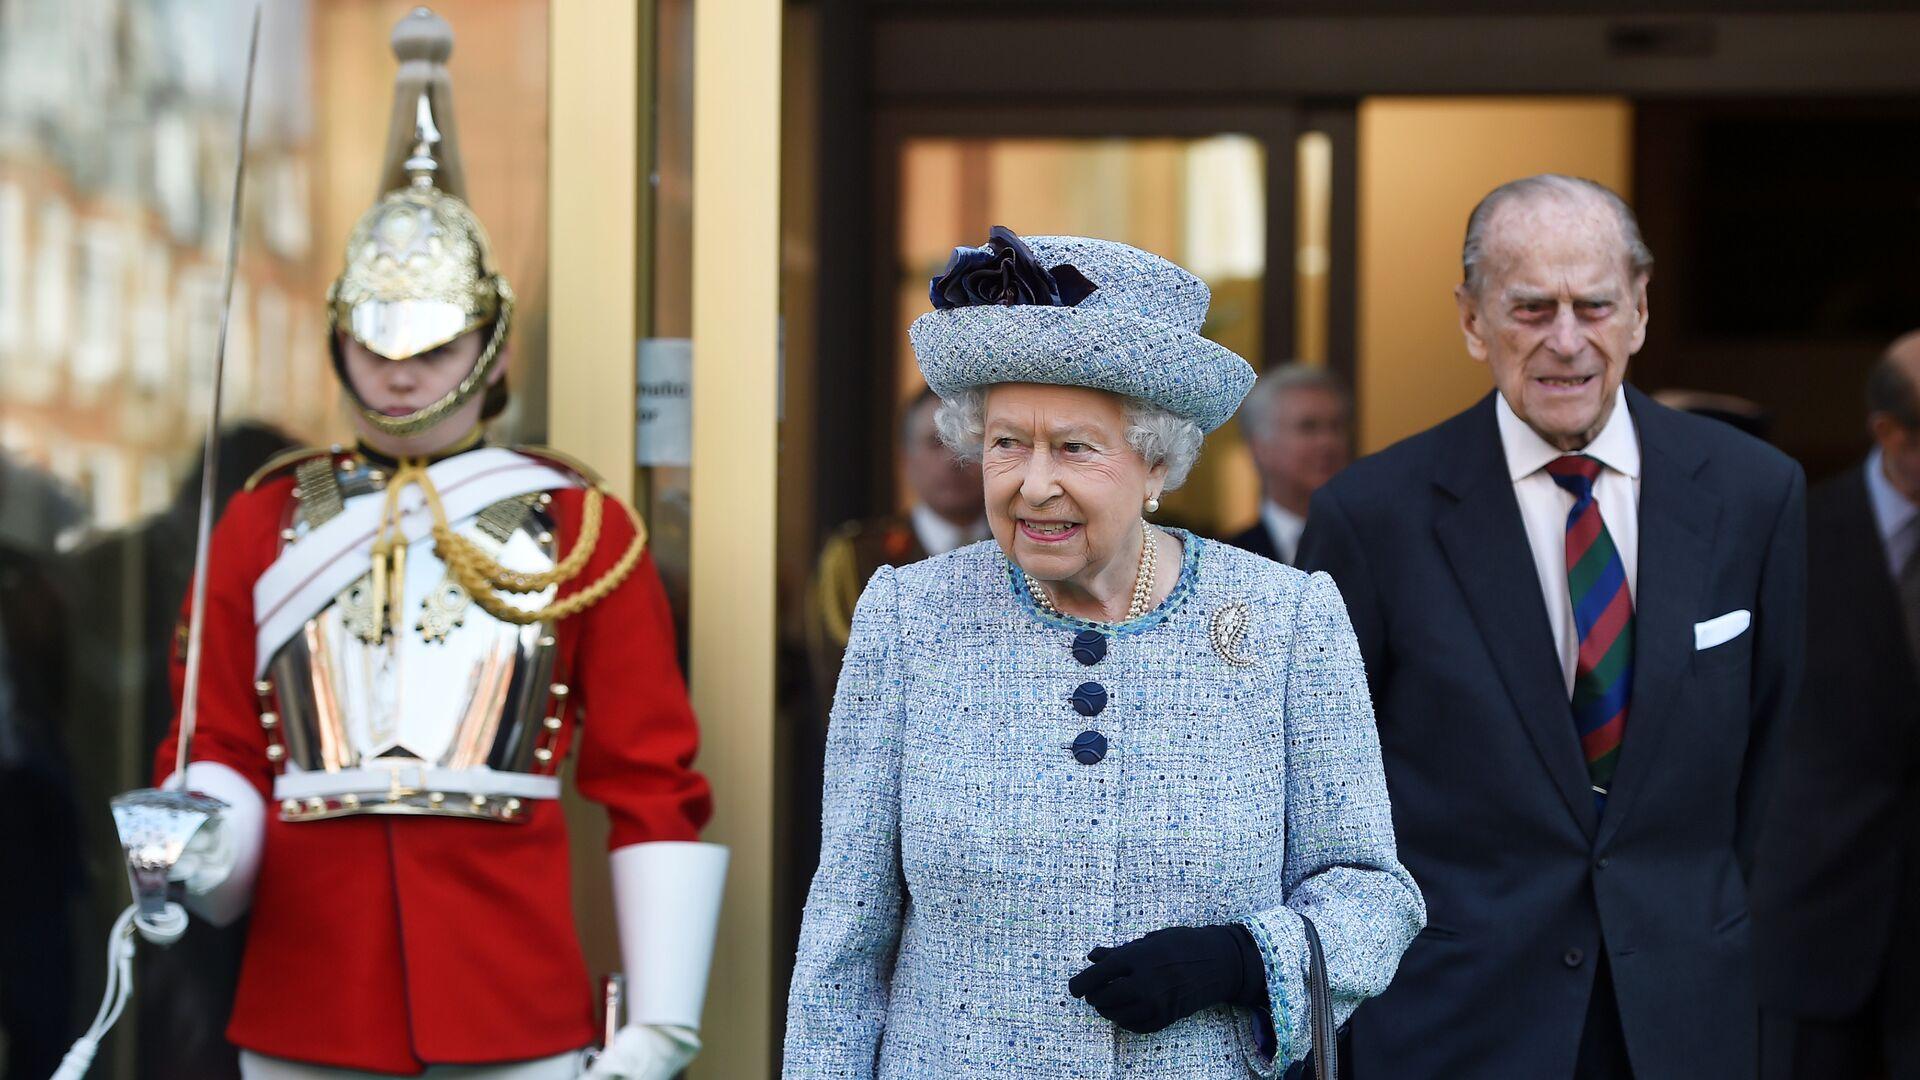 Britain's Queen Elizabeth II and Prince Philip, the Duke of Edinburgh leave the National Army Museum in London, Britain March 16, 2017. REUTERS/Hannah McKay - Sputnik Mundo, 1920, 09.04.2021